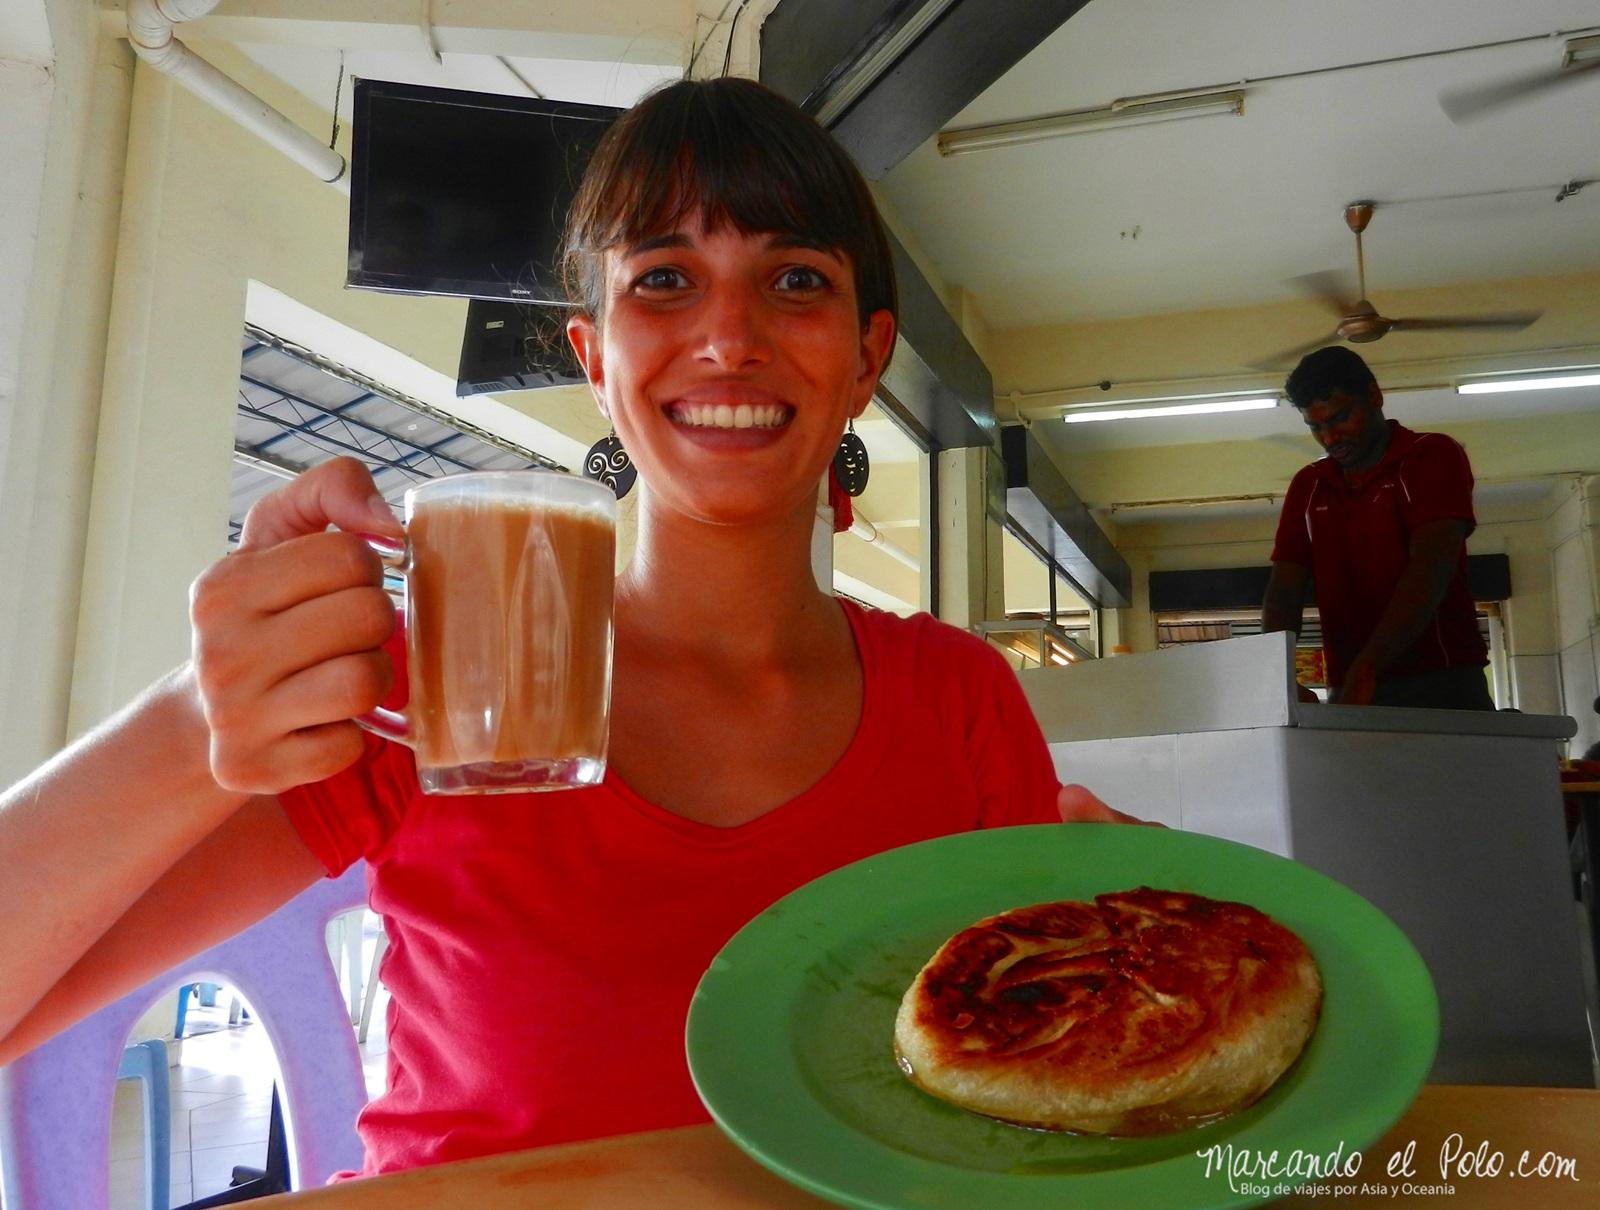 Roti boom + teh tarik = desayuno perfecto en Malasia